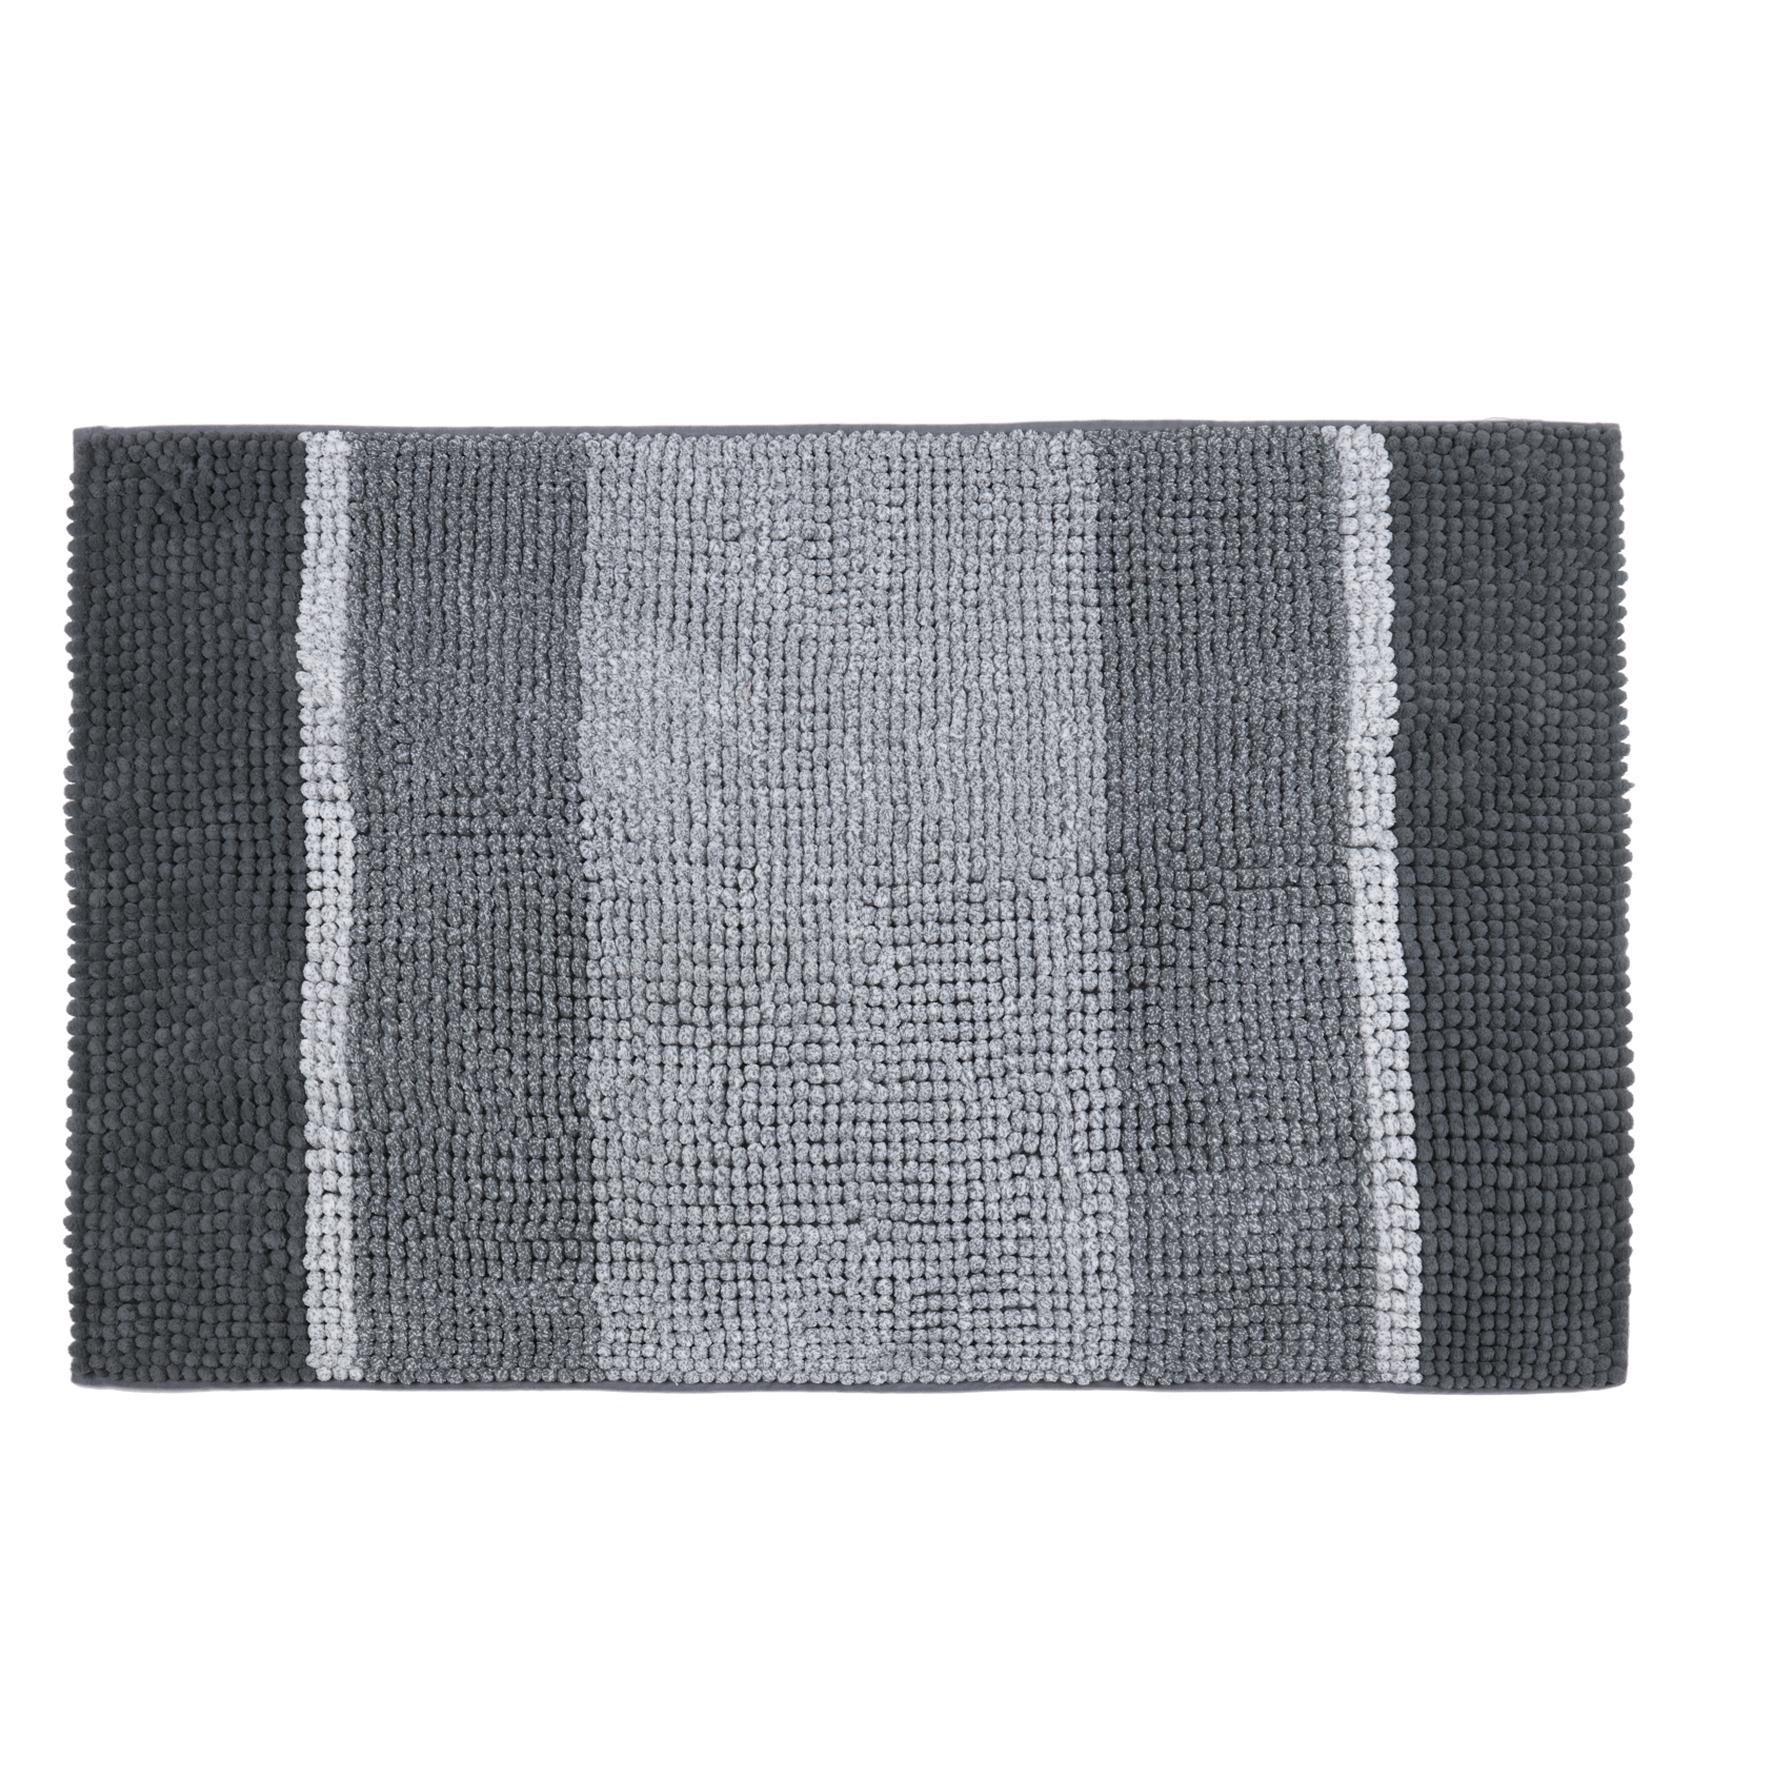 Differnz Fading badmat 60x90cm grijs